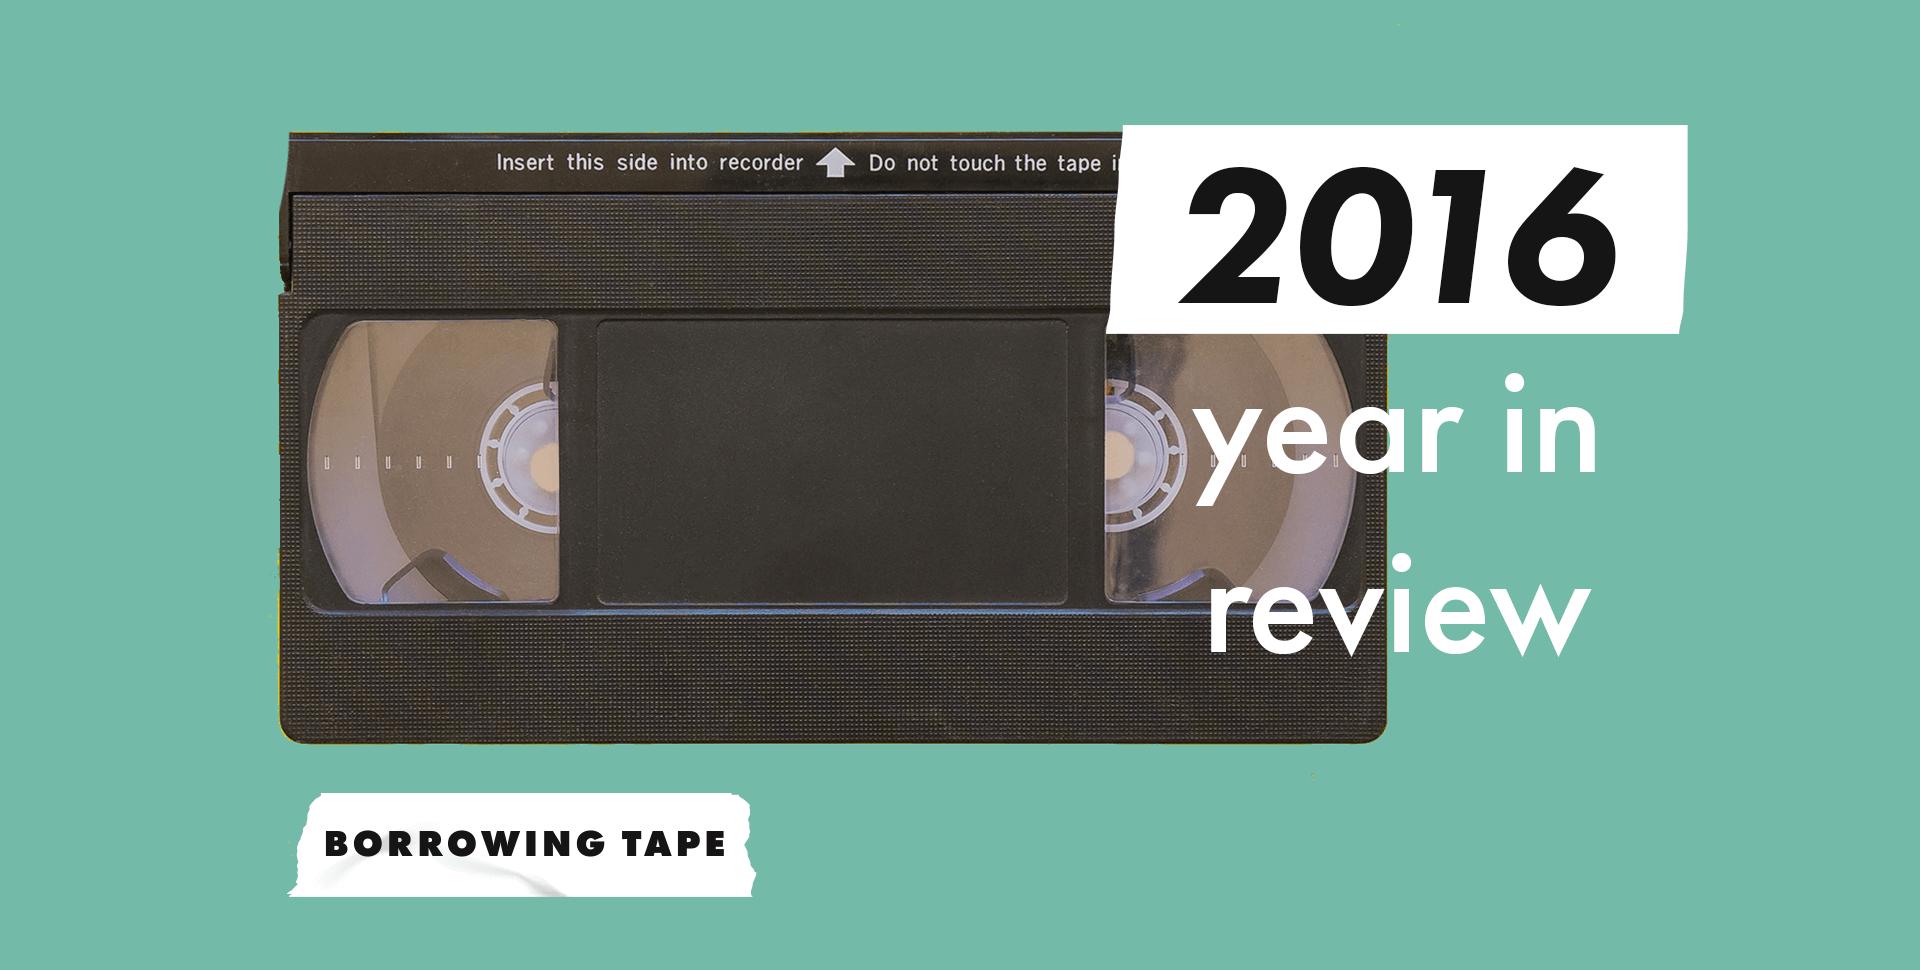 Best Movies of 2016 - Top 5